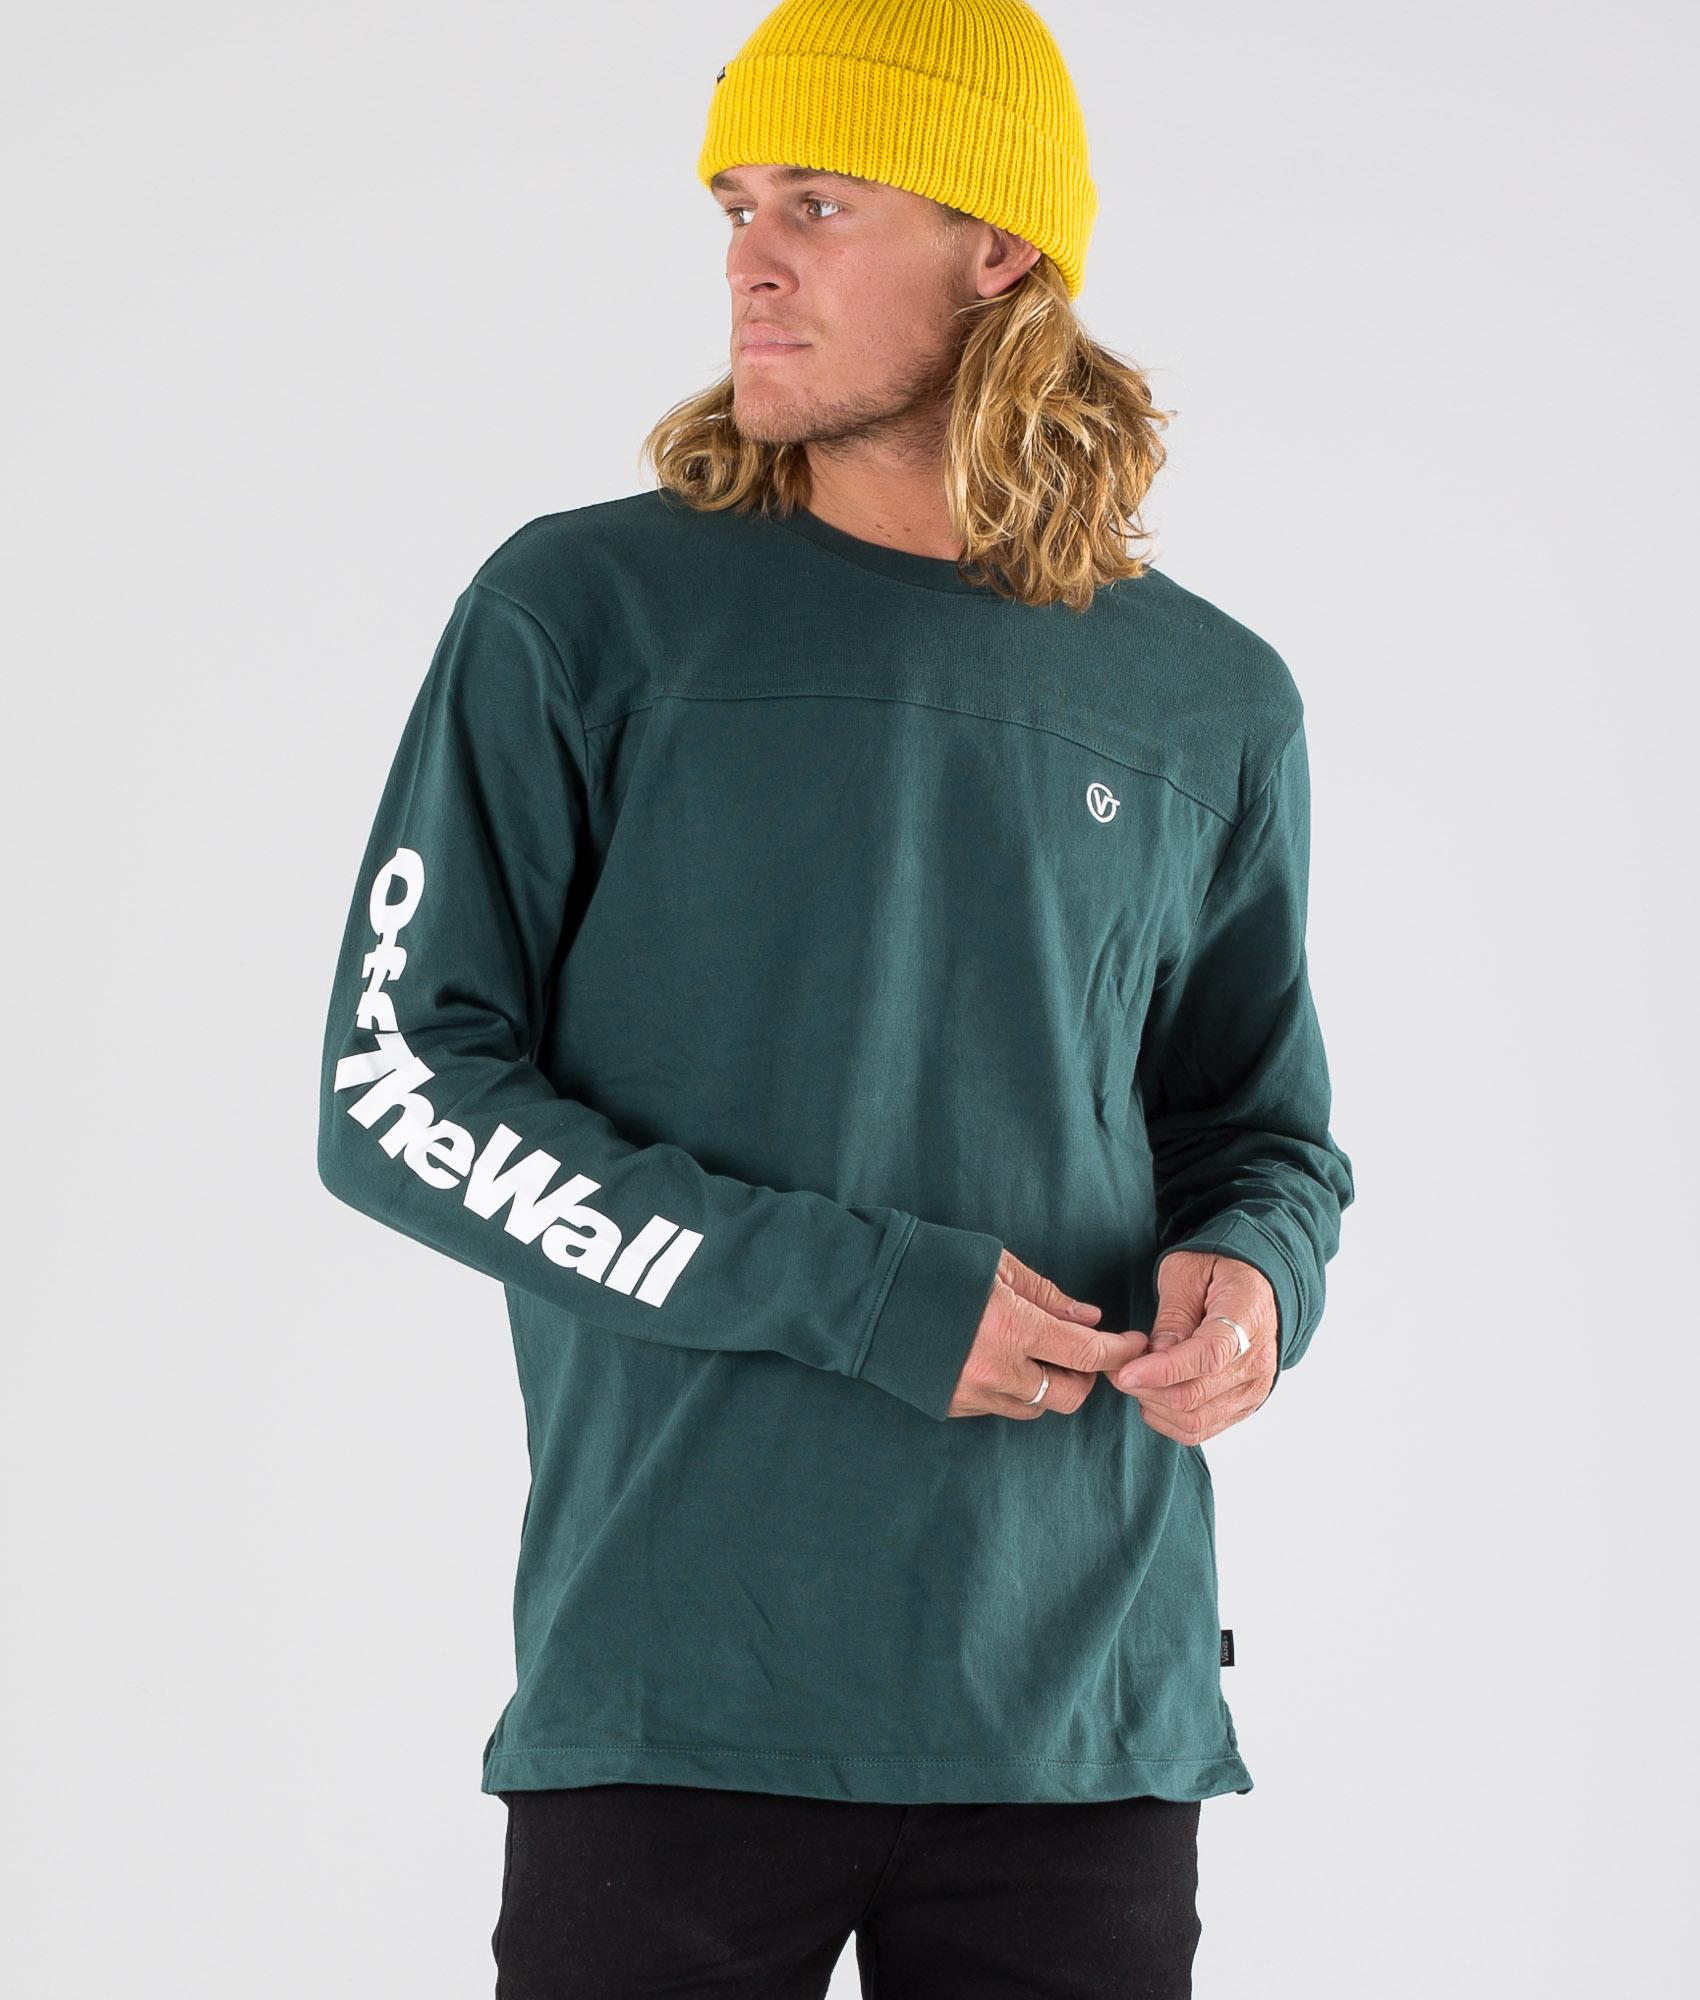 Vans streetwear Kaufe hier online! |